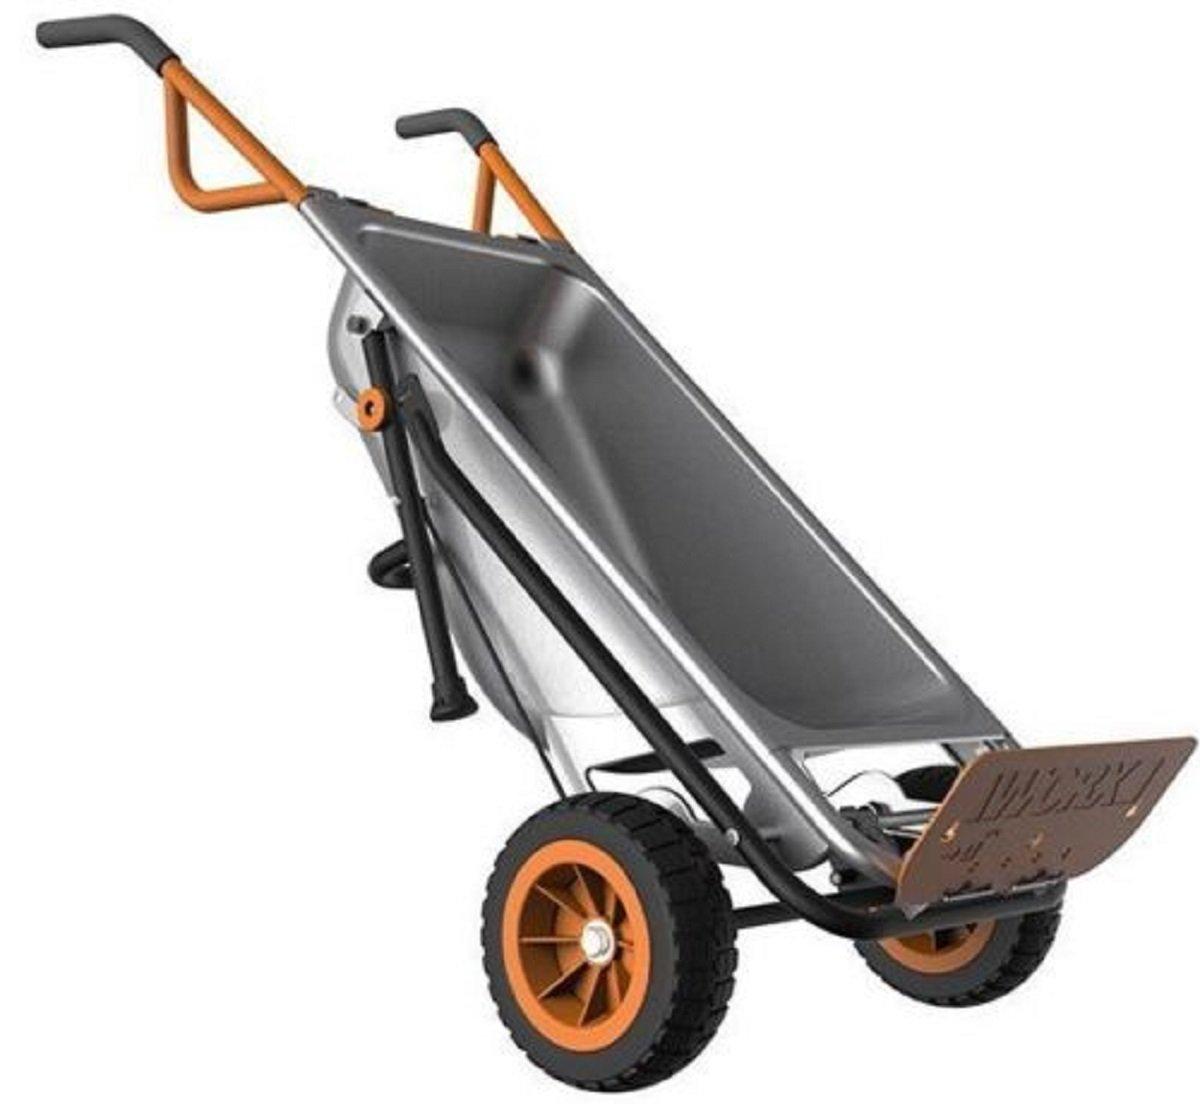 WG050 WORX AeroCart: 8-in-1 Multi-Function WheelBarrow Yard Cart, New, Free Shipping